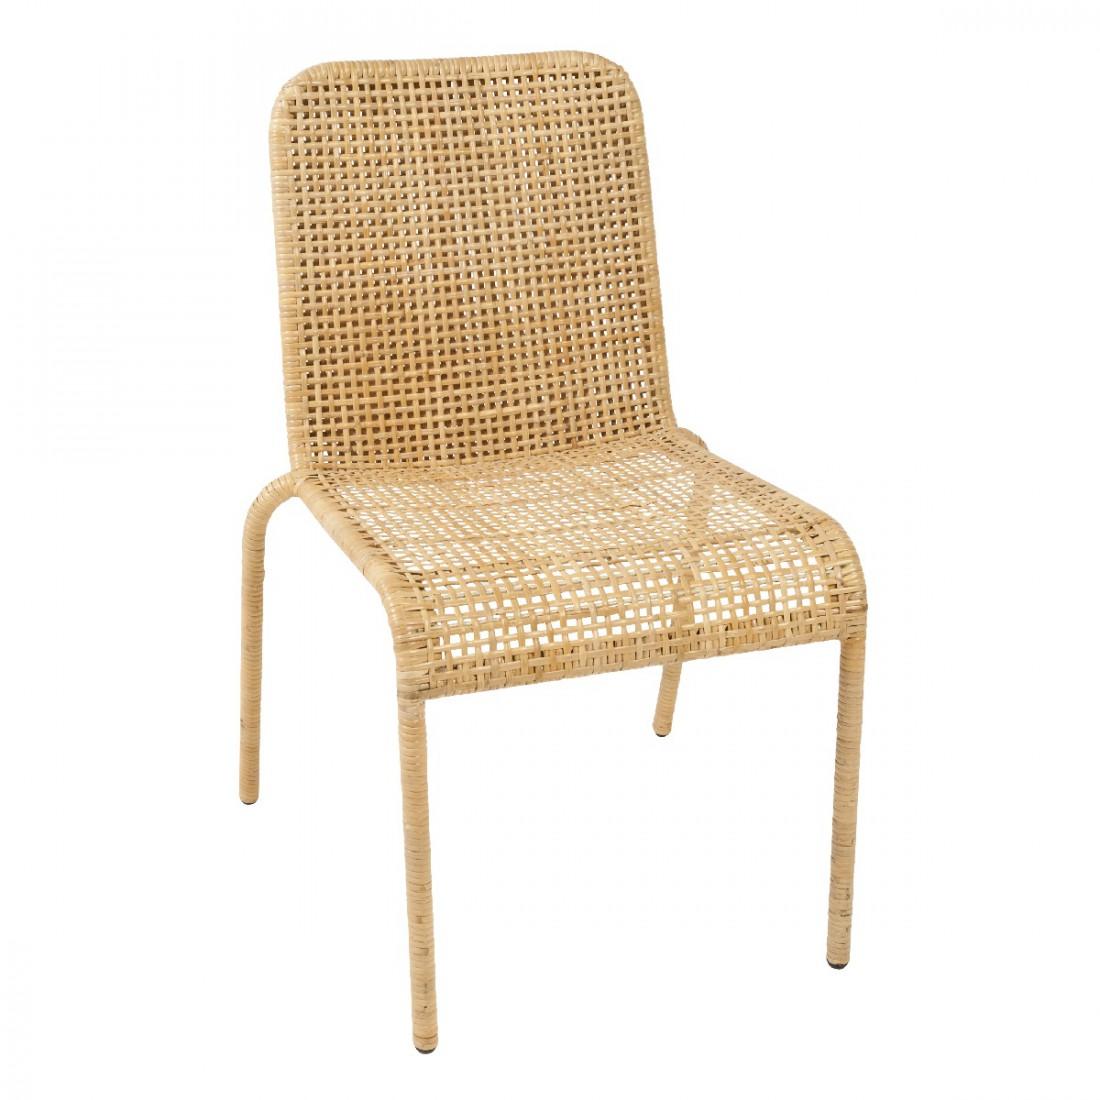 Chaise en clisse de rotin trinidad chaise rotin kok for Chaise et table en rotin